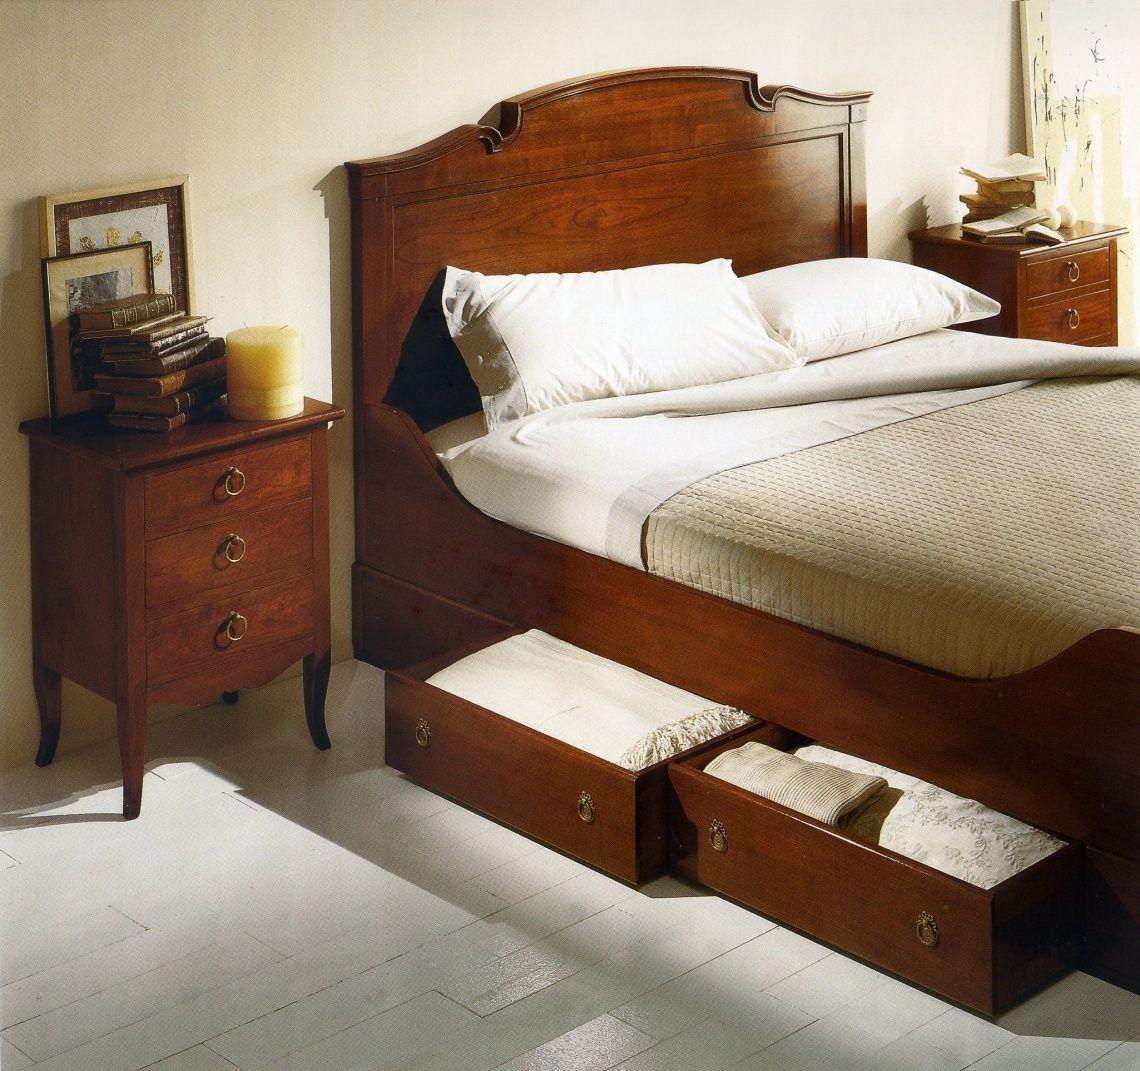 083 cama con cajones abajo en cerezo madera pinterest for Sillon cama con cajones